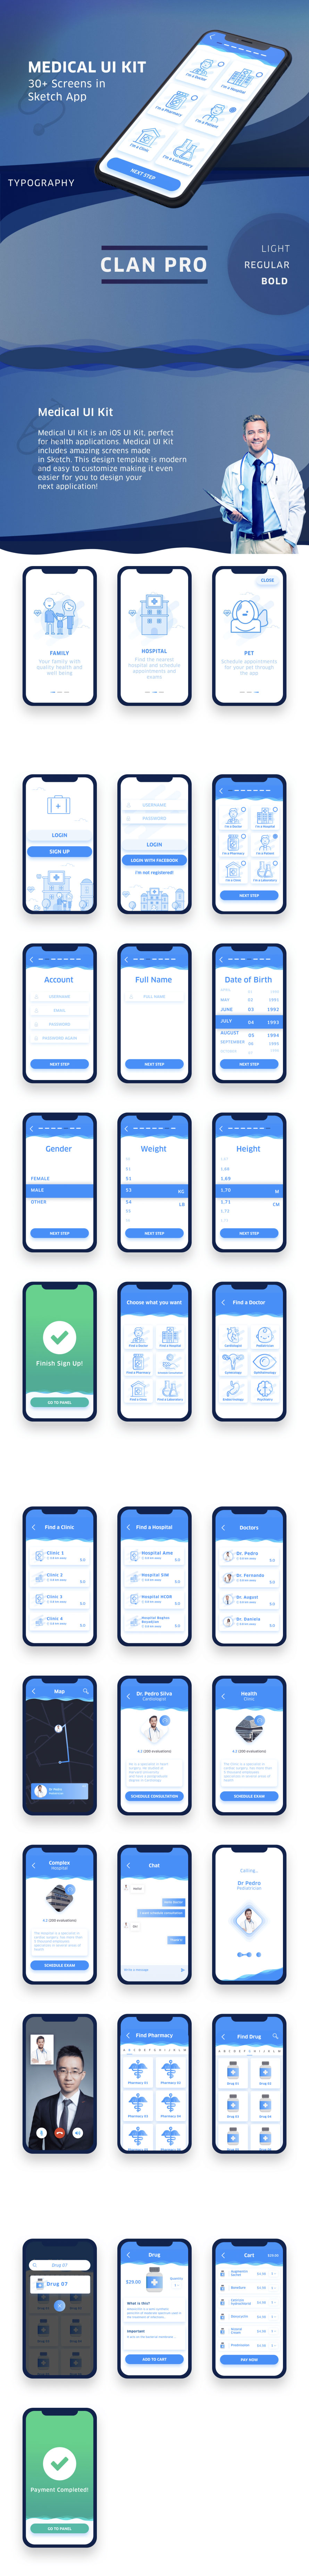 iPhone X医疗就诊和预约类APP Ui Kits模板下载[Sketch]